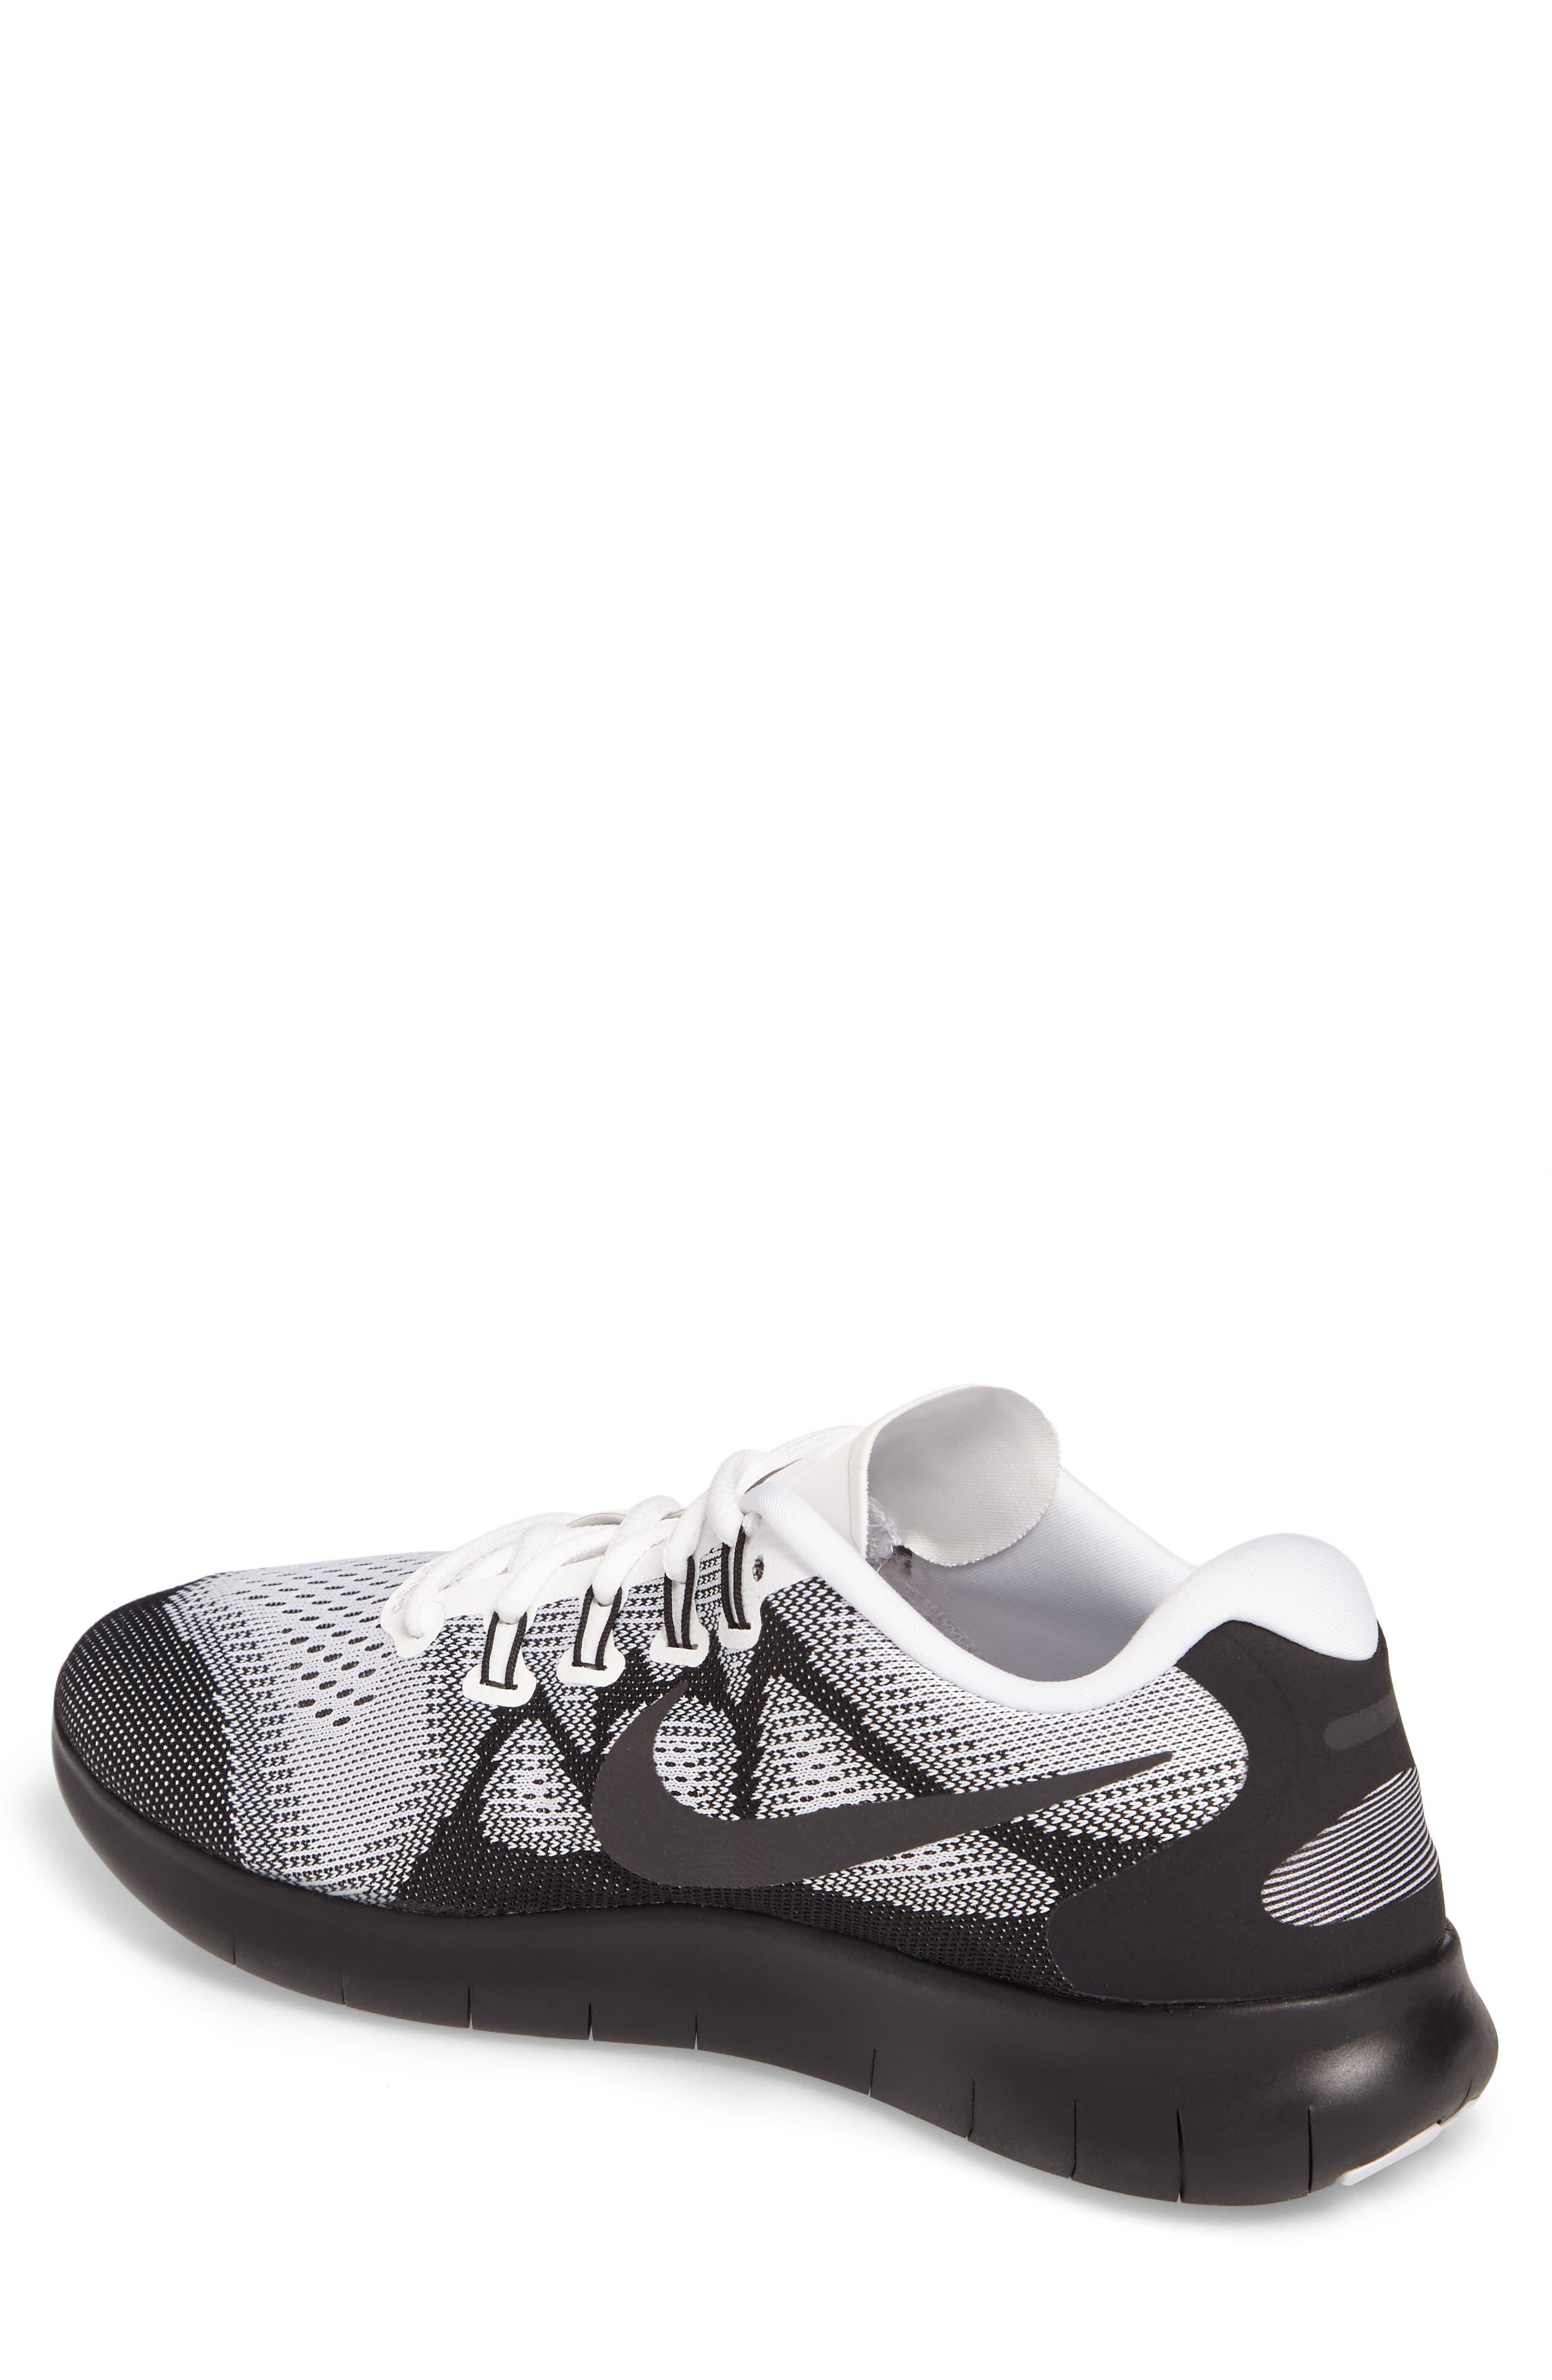 Free RN 2017 LE Running Shoe,                             Alternate thumbnail 2, color,                             002